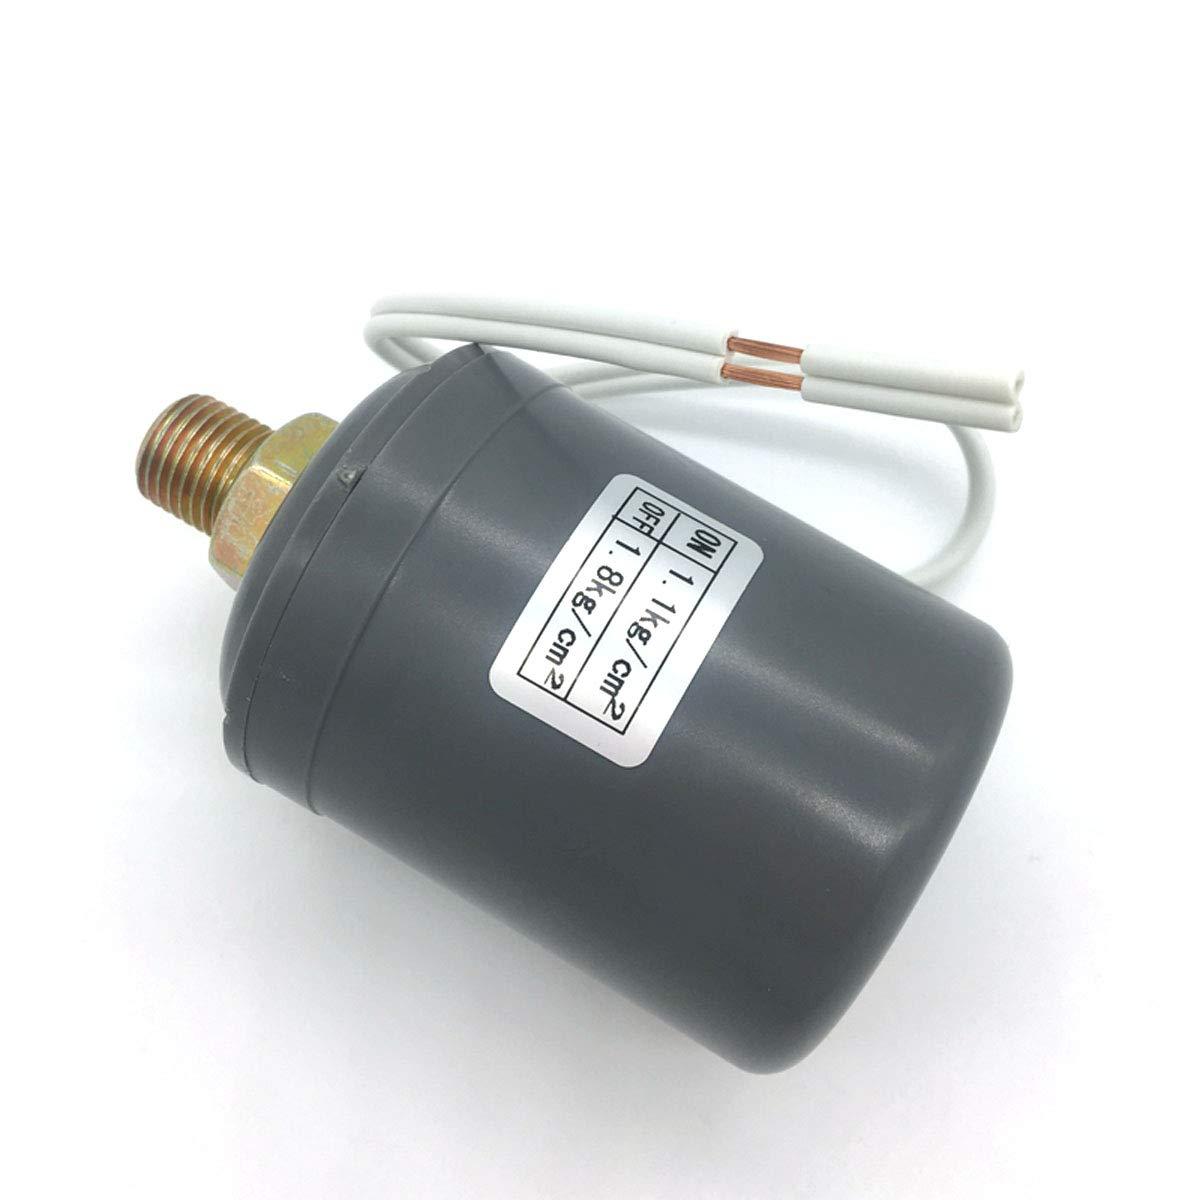 Bringsmart SK-3B Mini Water Pump Pressure Automatic Switch Mechanical Adjustable Press Switch (SK-3B)